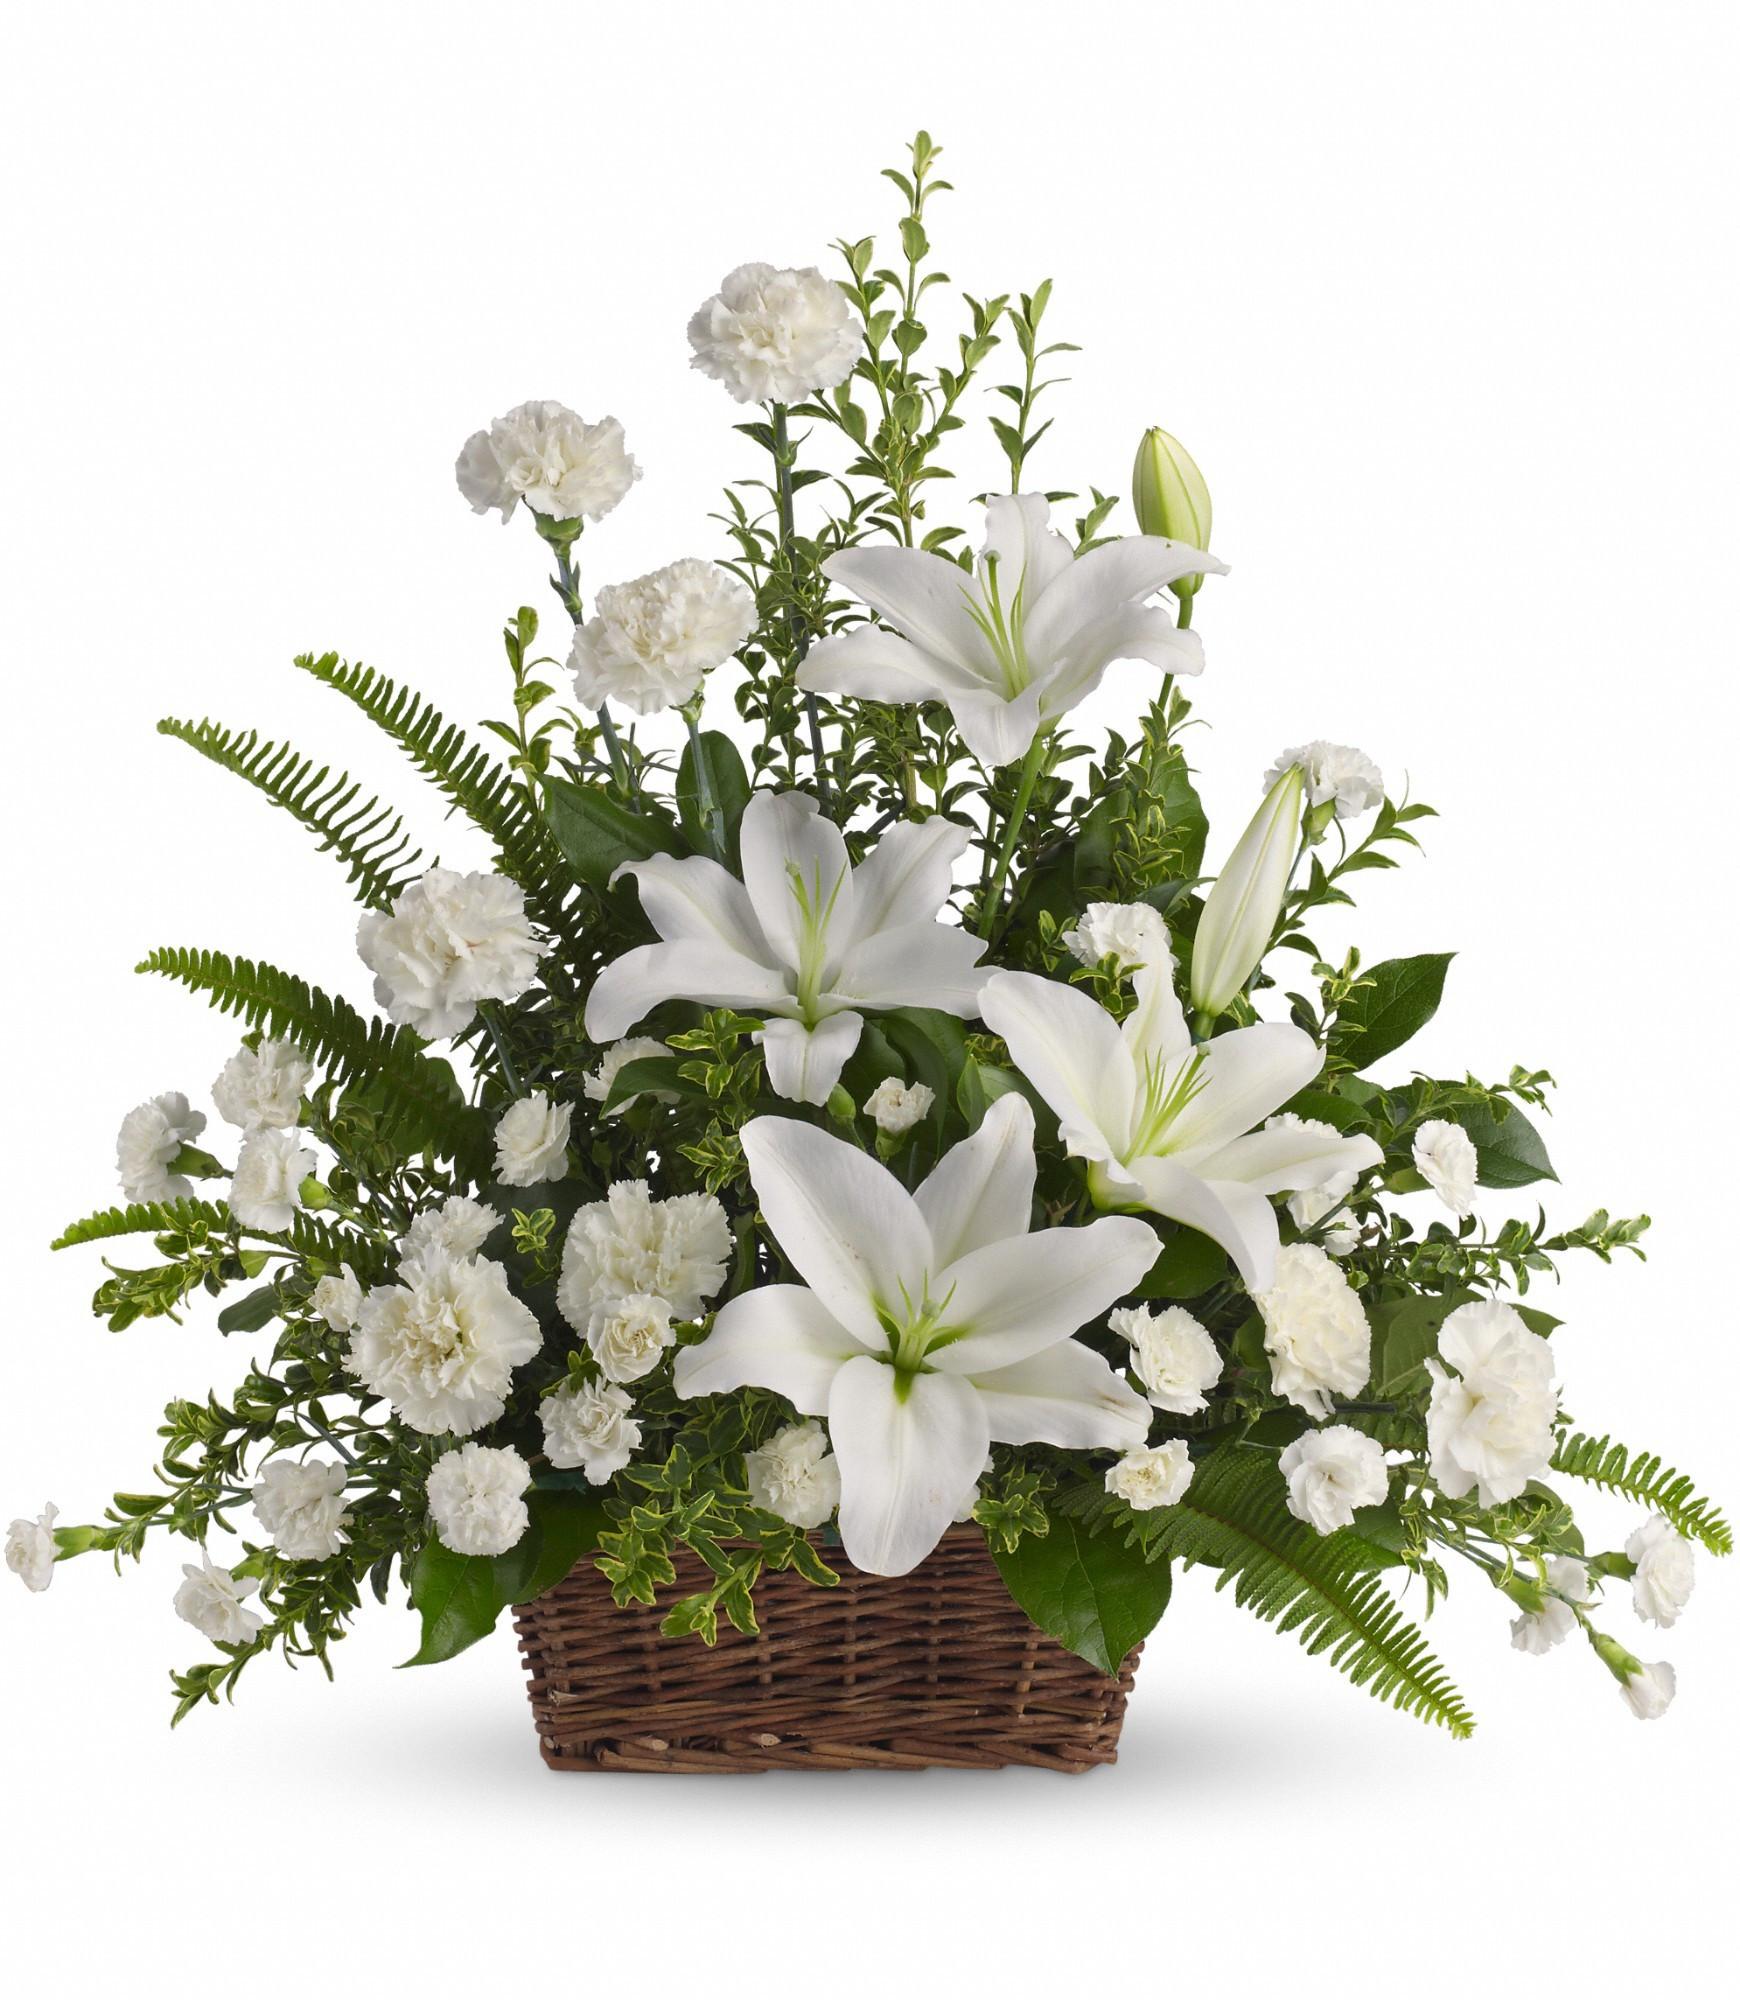 10 Perfect Teleflora Gift Vase